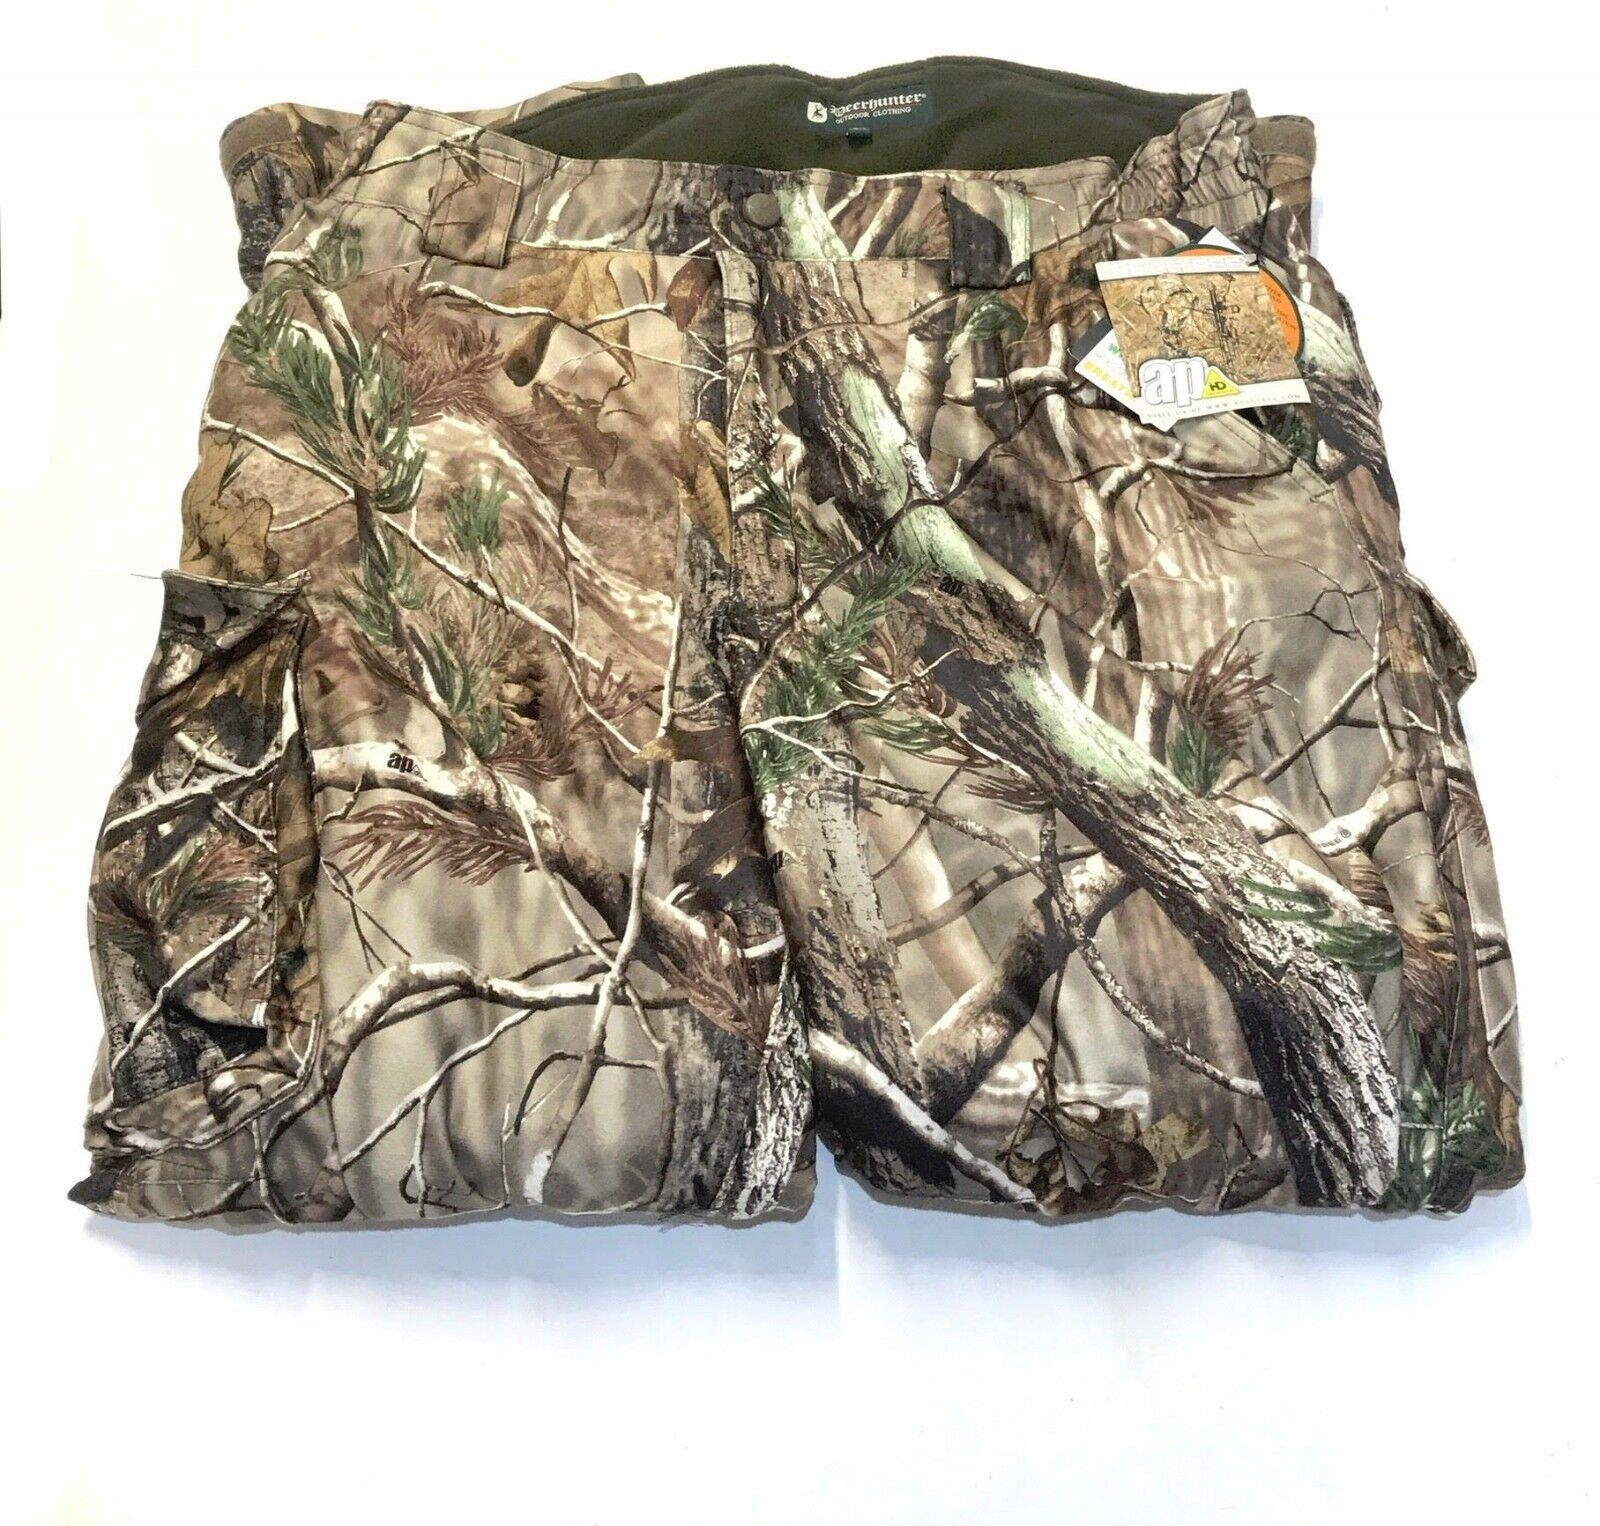 Deerhunter Ram Realtree  Camo Waterproof Shooting Trousers  100% price guarantee